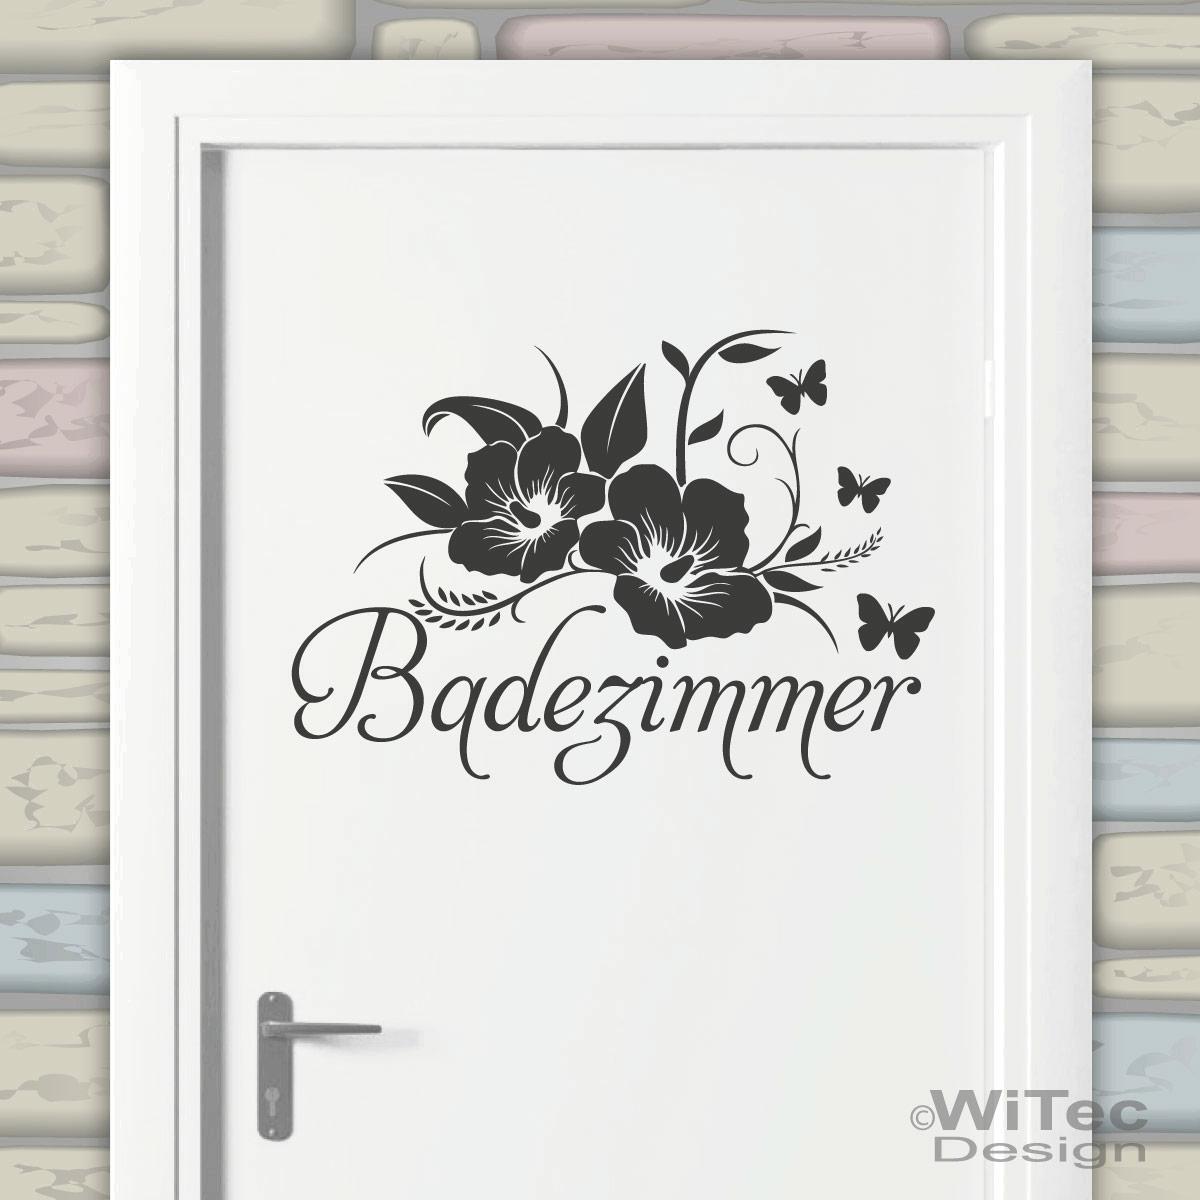 Türaufkleber Tür Aufkleber Badezimmer Hibiskus Blumen